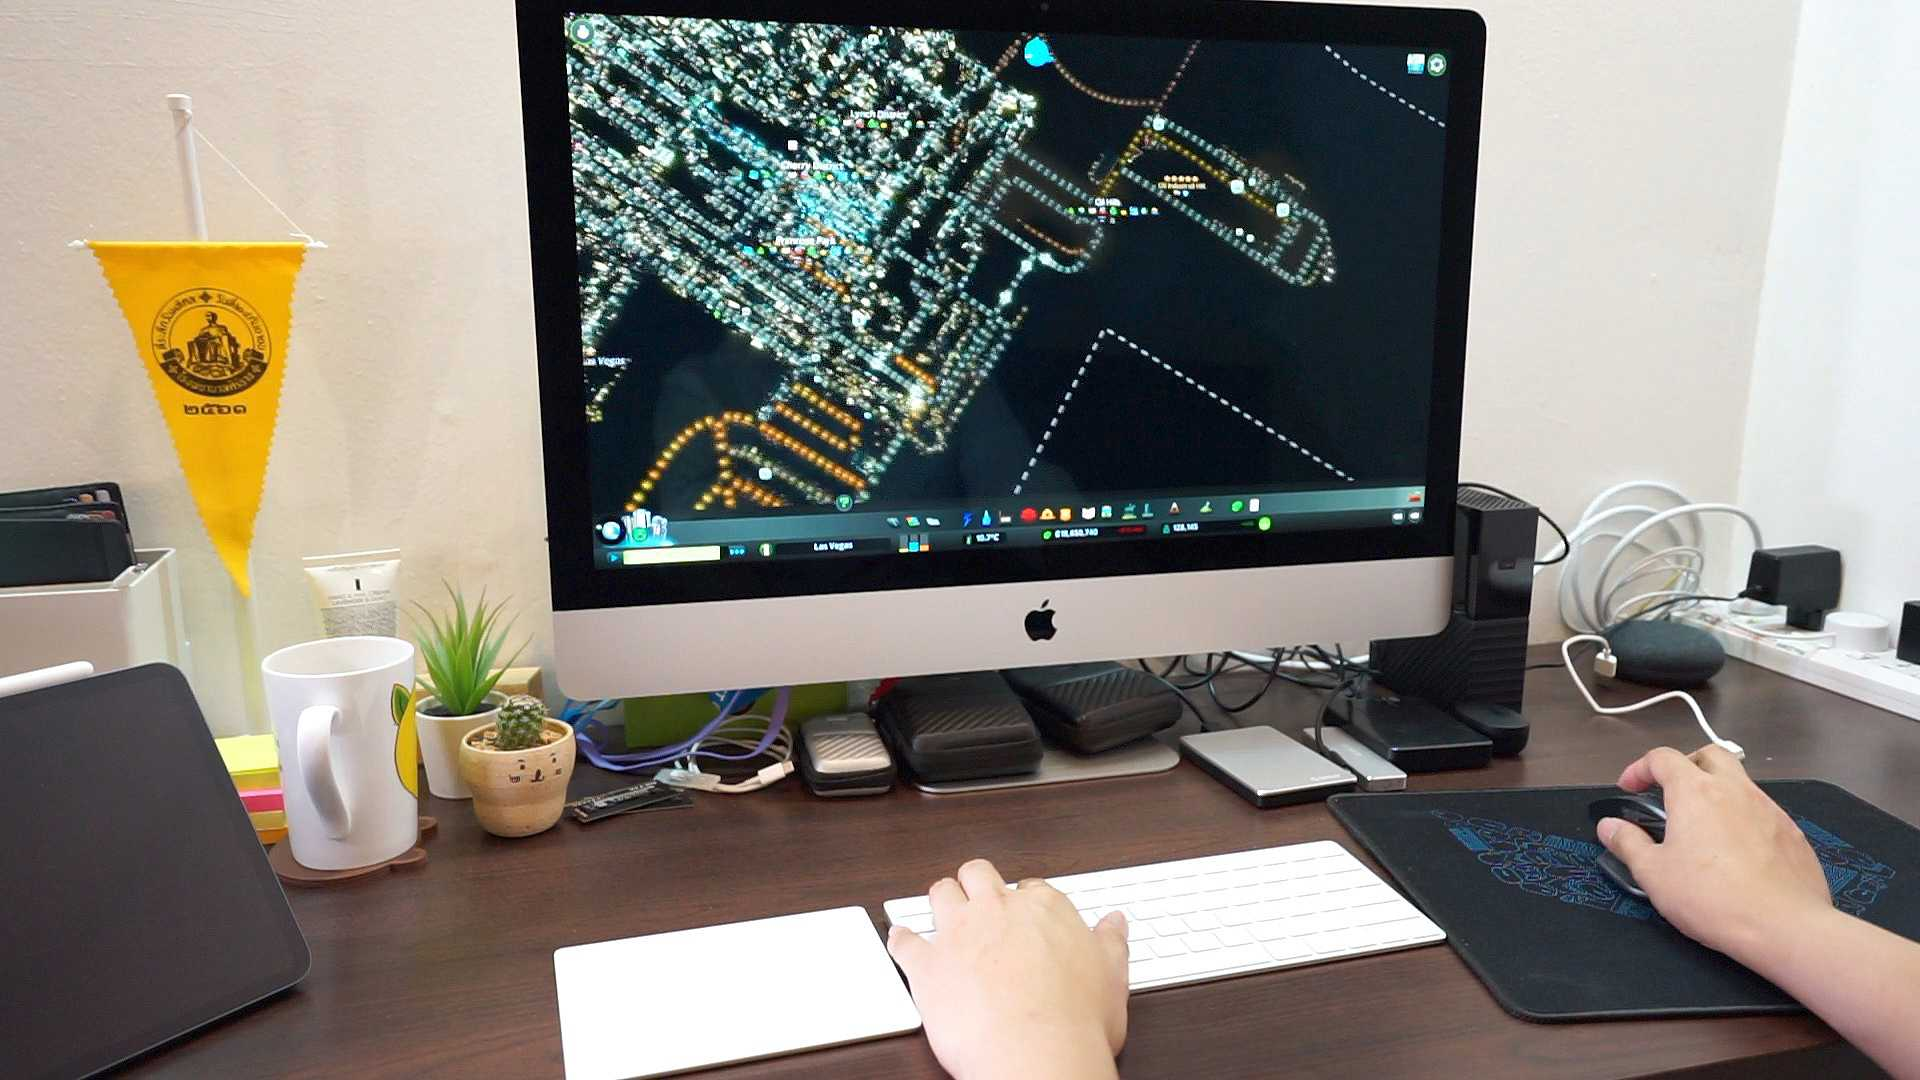 iMac 27-inch 2019 Playing Cities Skyline